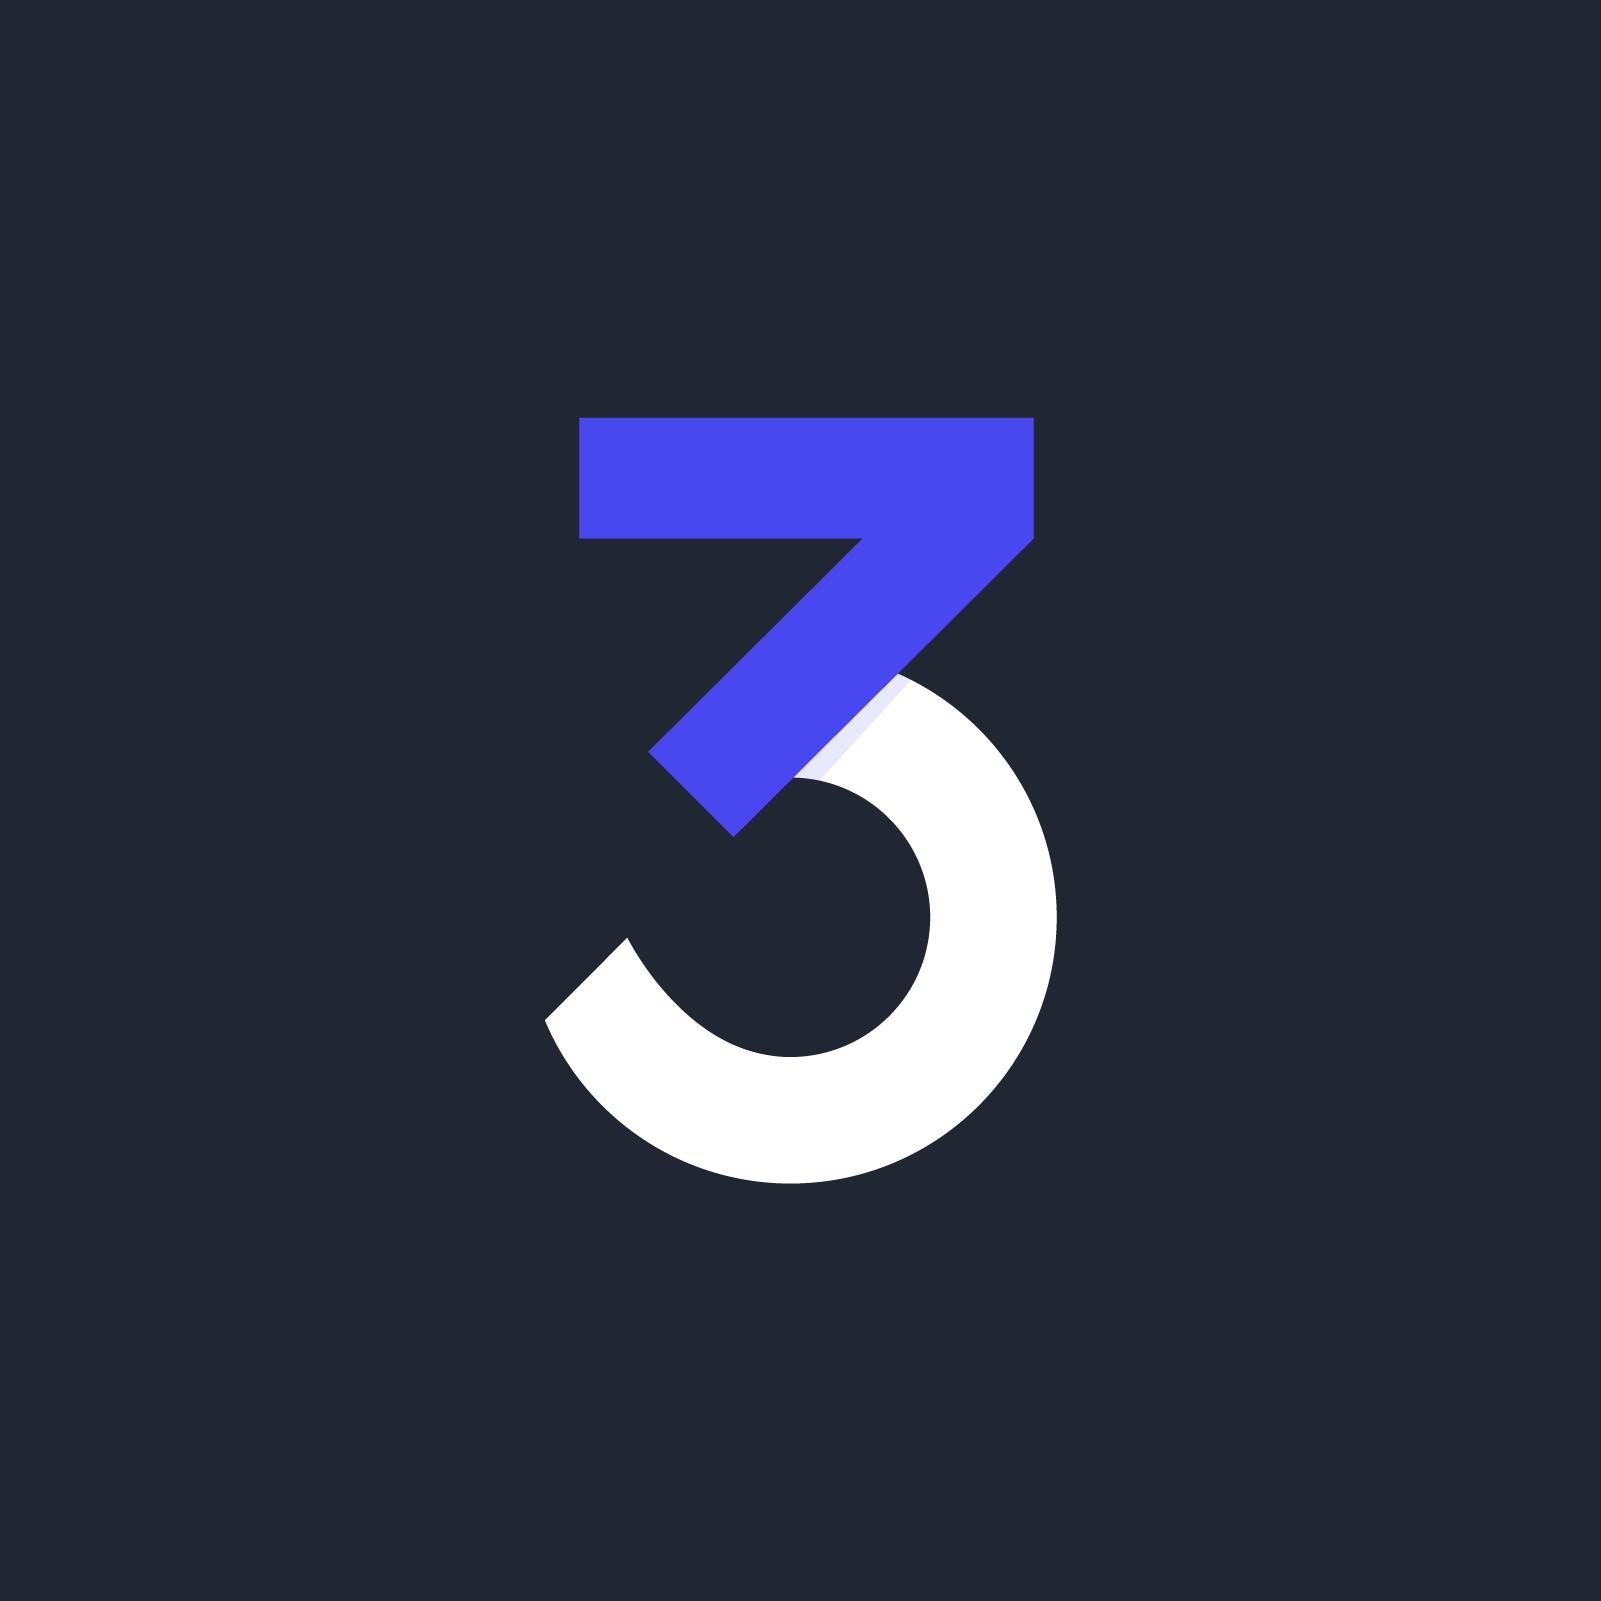 MD3 - Development, Outsourcing & Design Logo